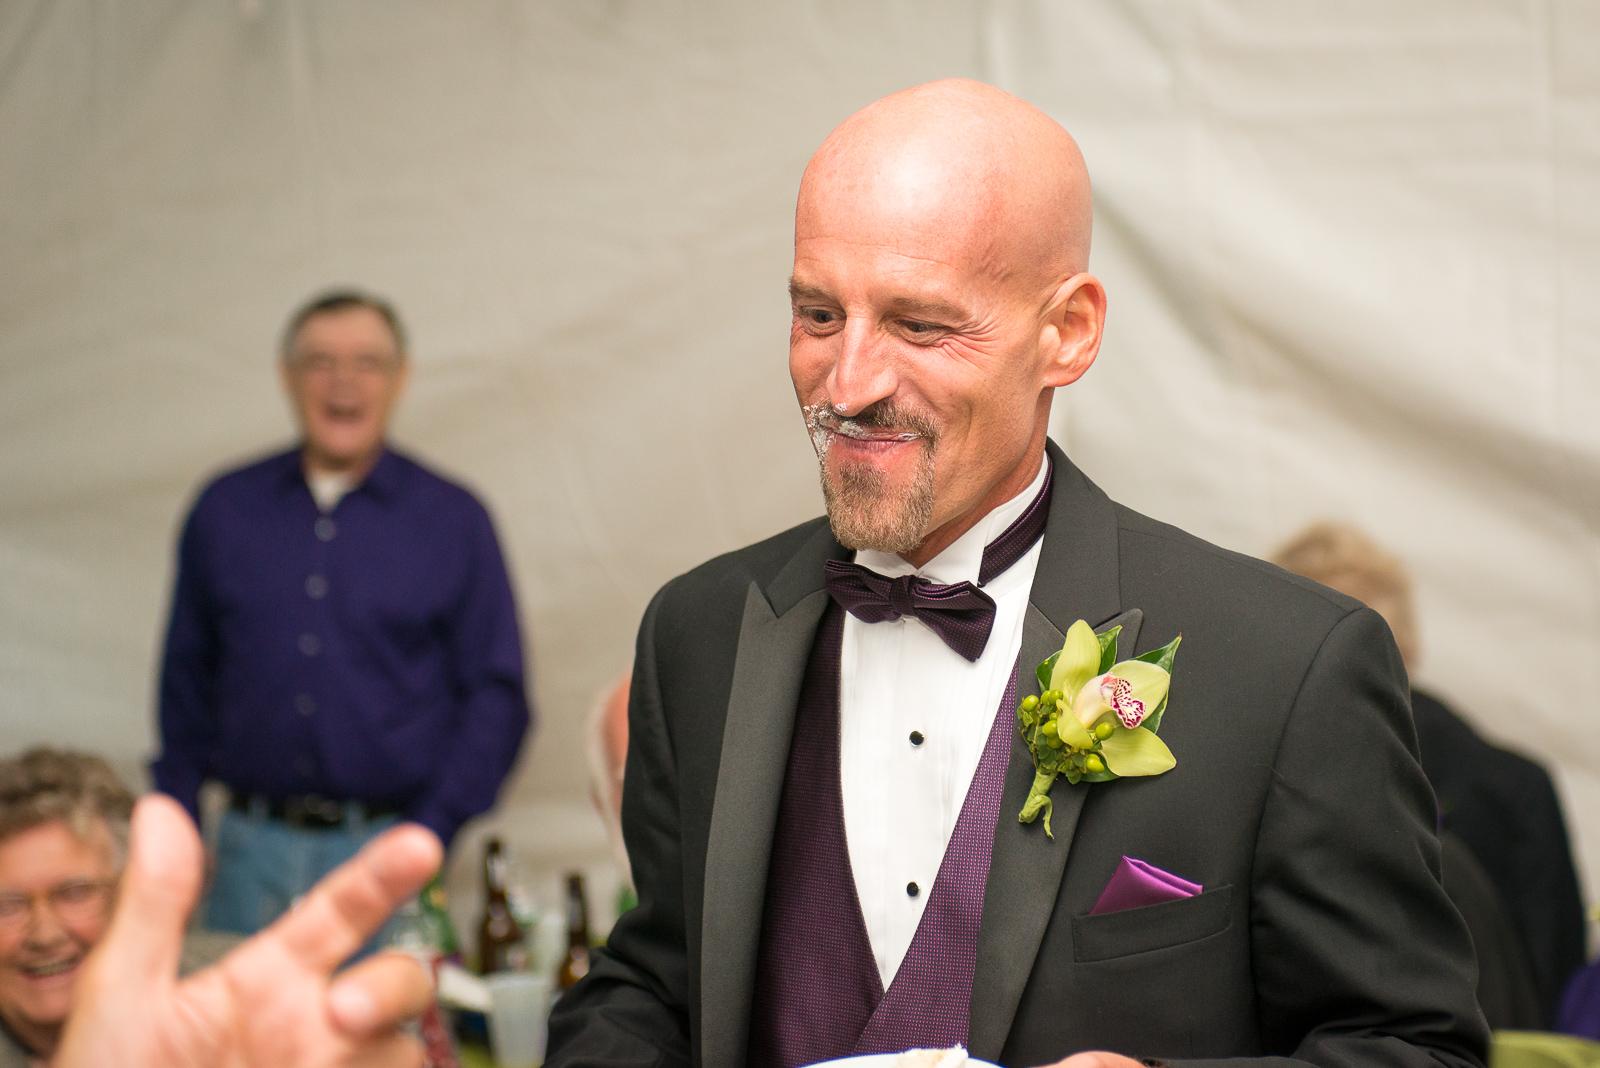 Michael-Napier-Weddings-Ludwig-Guilbeau Wedding-20 (40).jpg